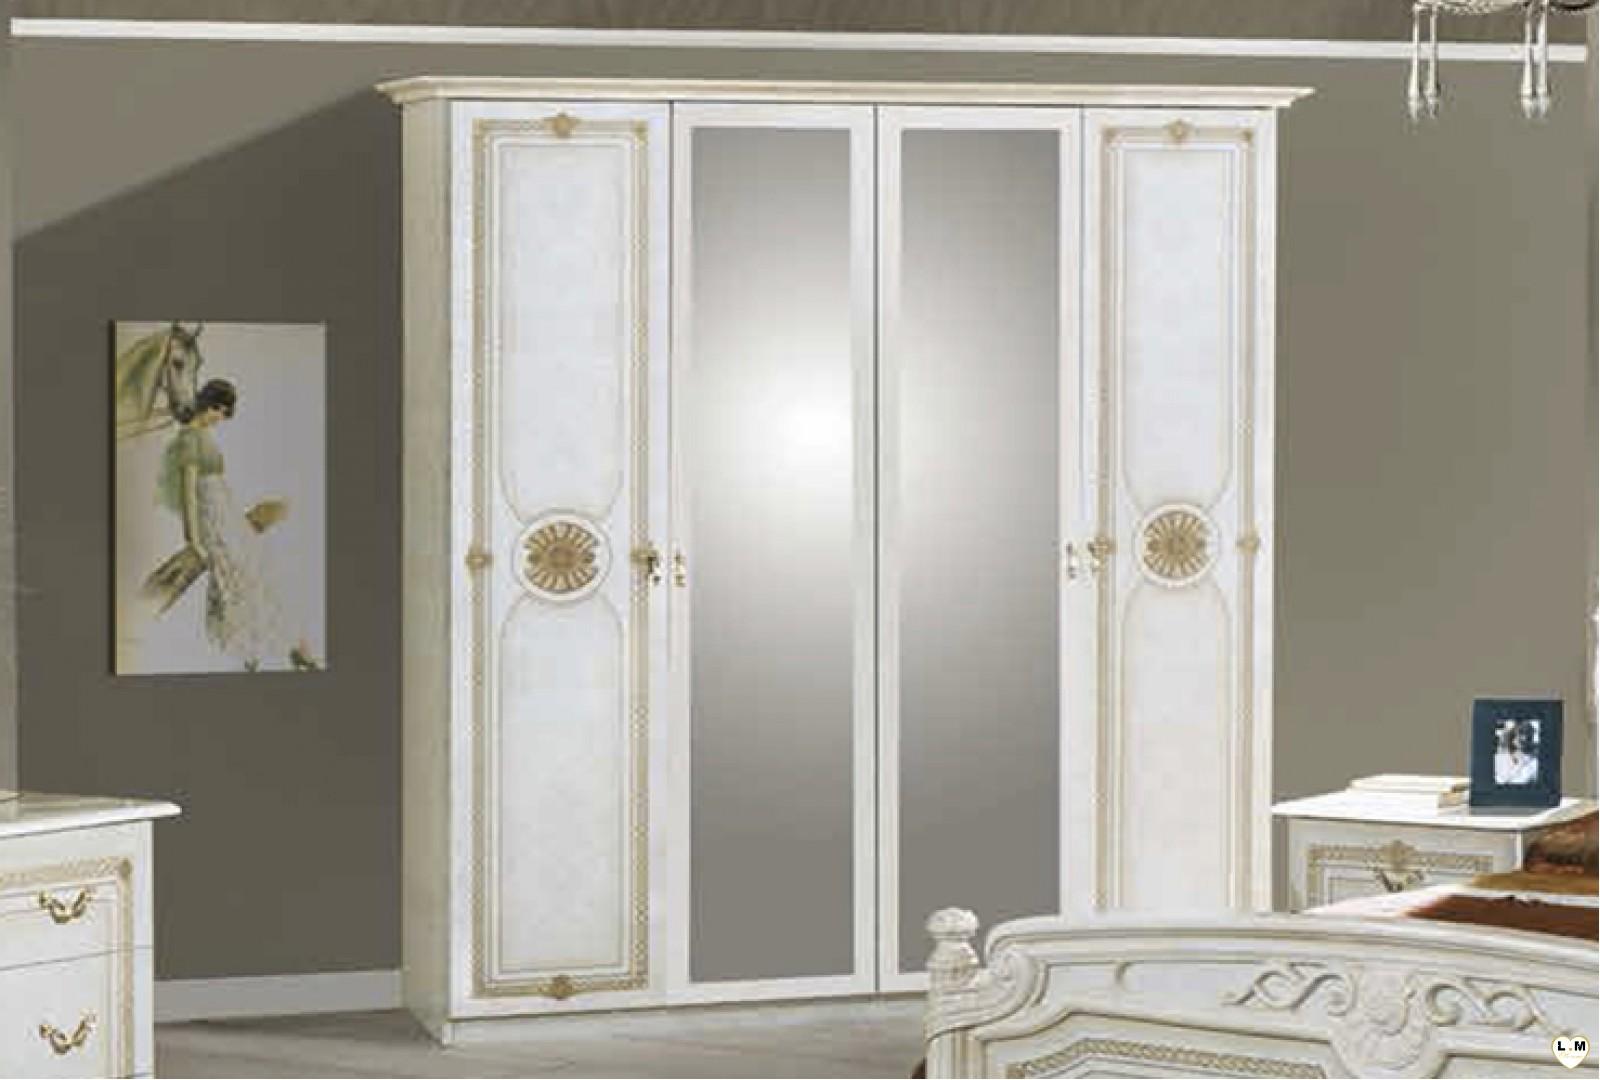 Janeiro laque blanc et dore ensemble chambre a coucher lignemeuble com - Chambre a coucher blanc laque ...